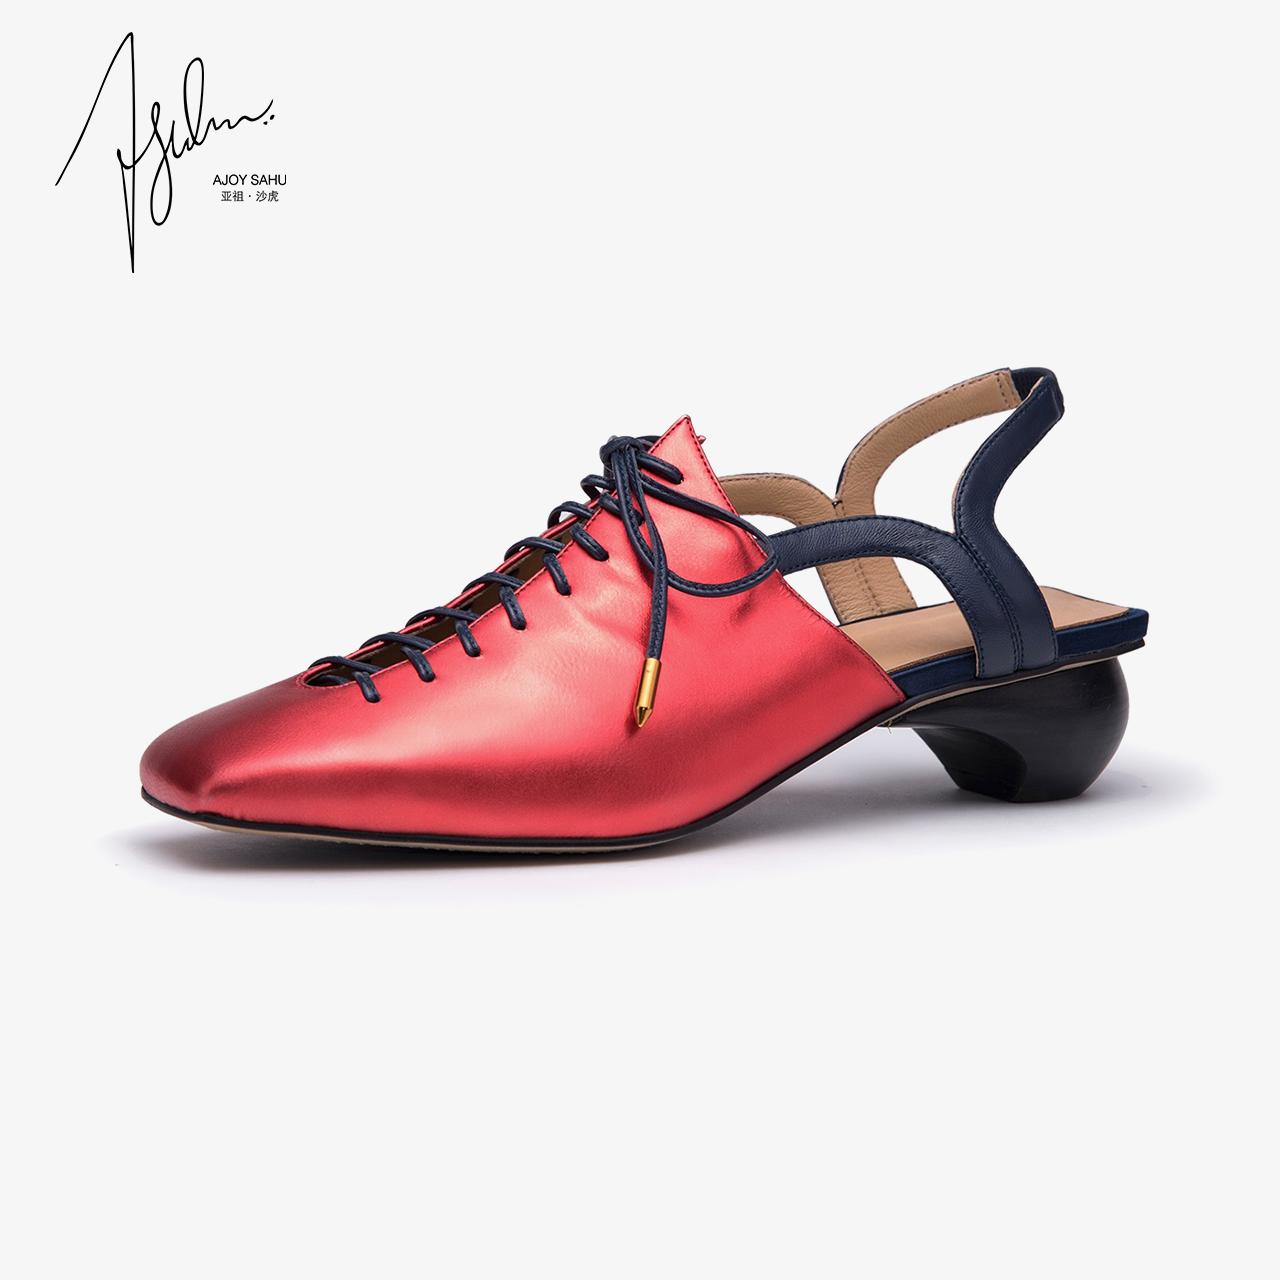 AJOY SAHU2018新款女鞋chic凉鞋女真皮女鞋镂空粗跟中跟包头鞋女